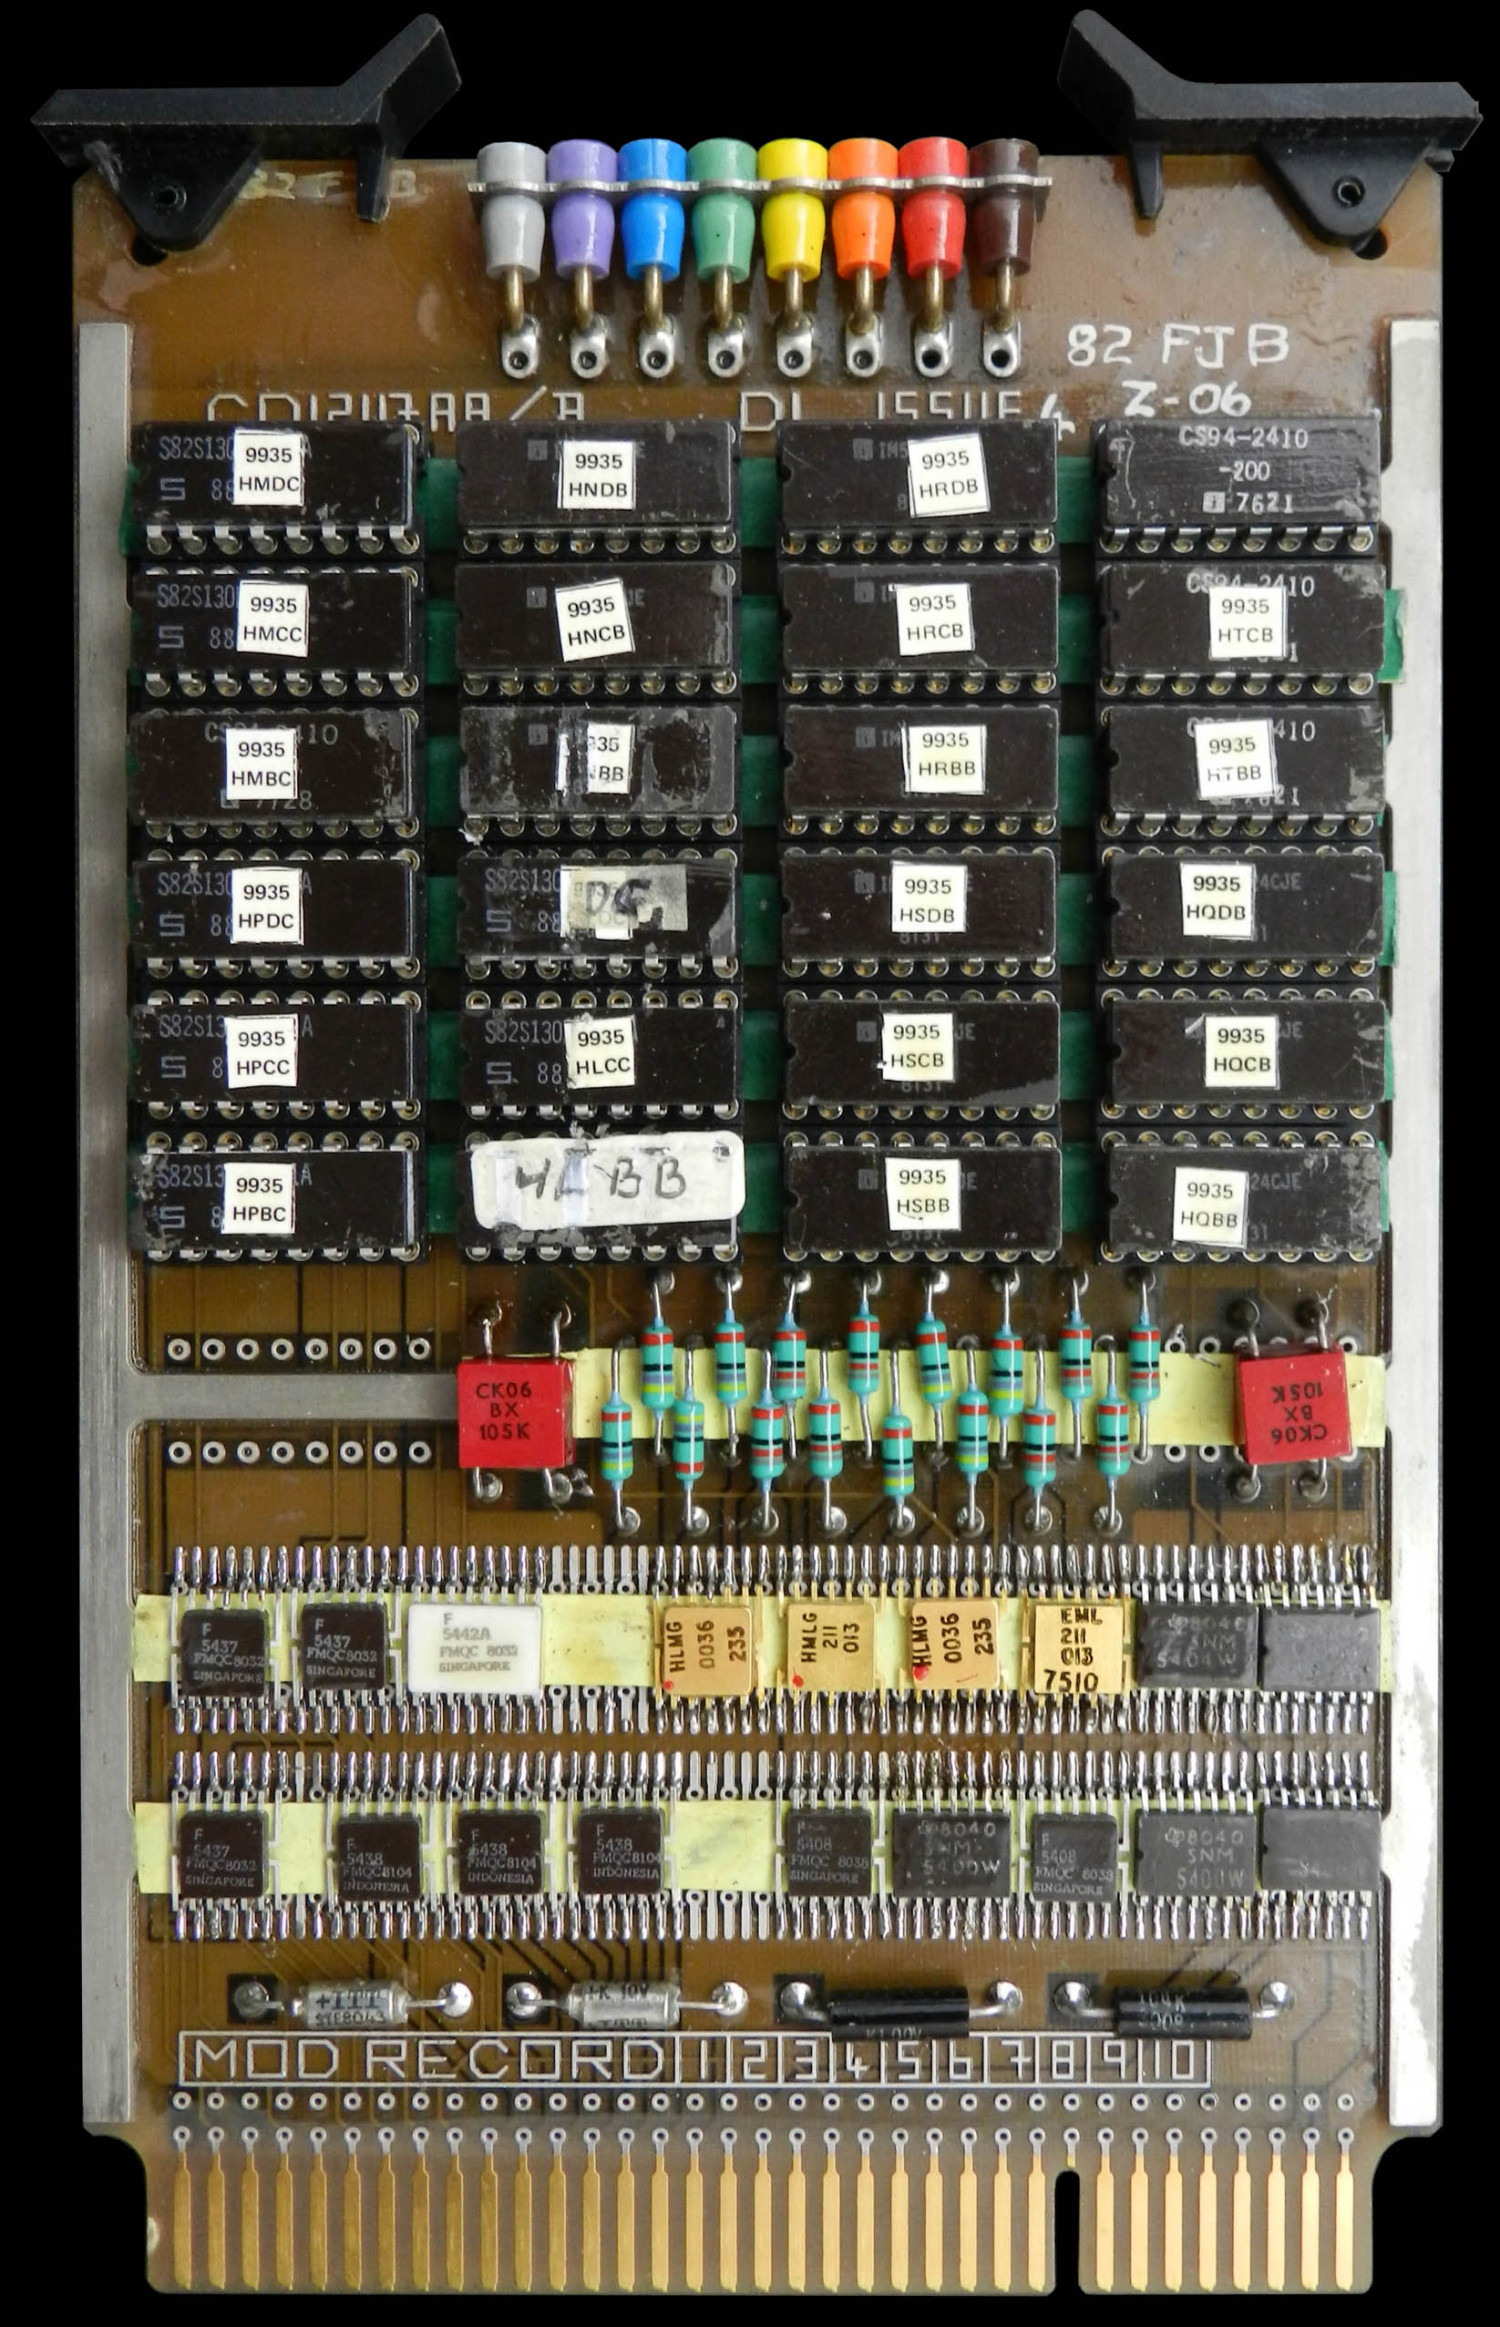 NCS1 Program Store 2 Circuit Board